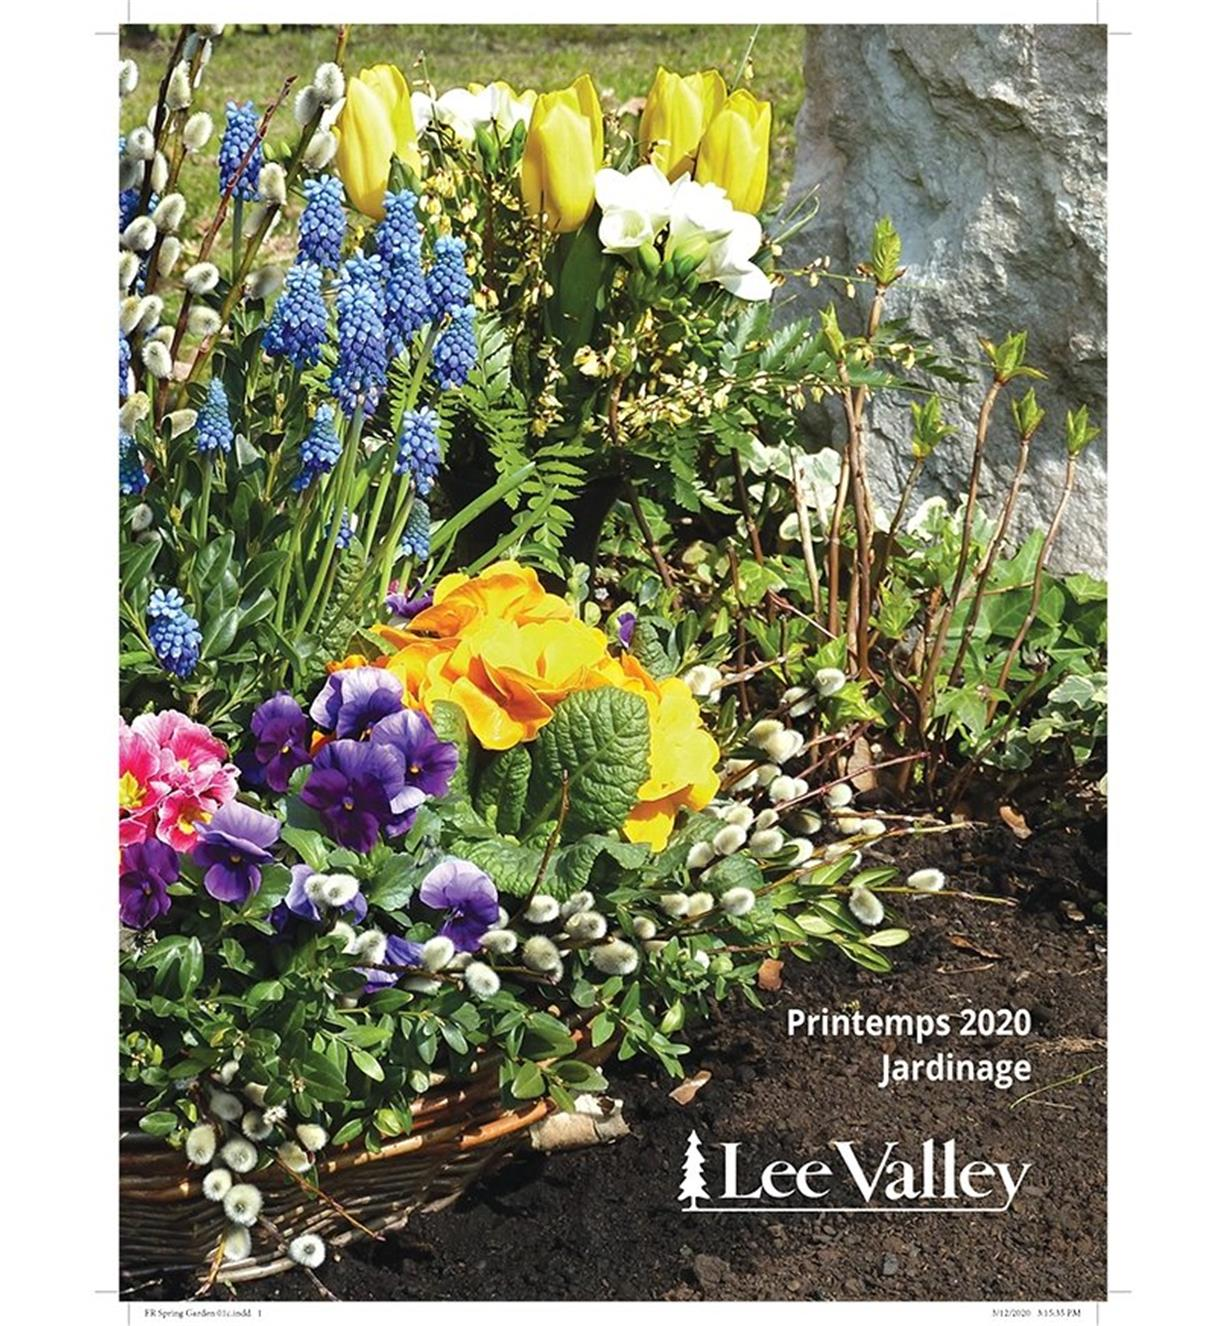 F0420G - Printemps 2020 - Jardinage